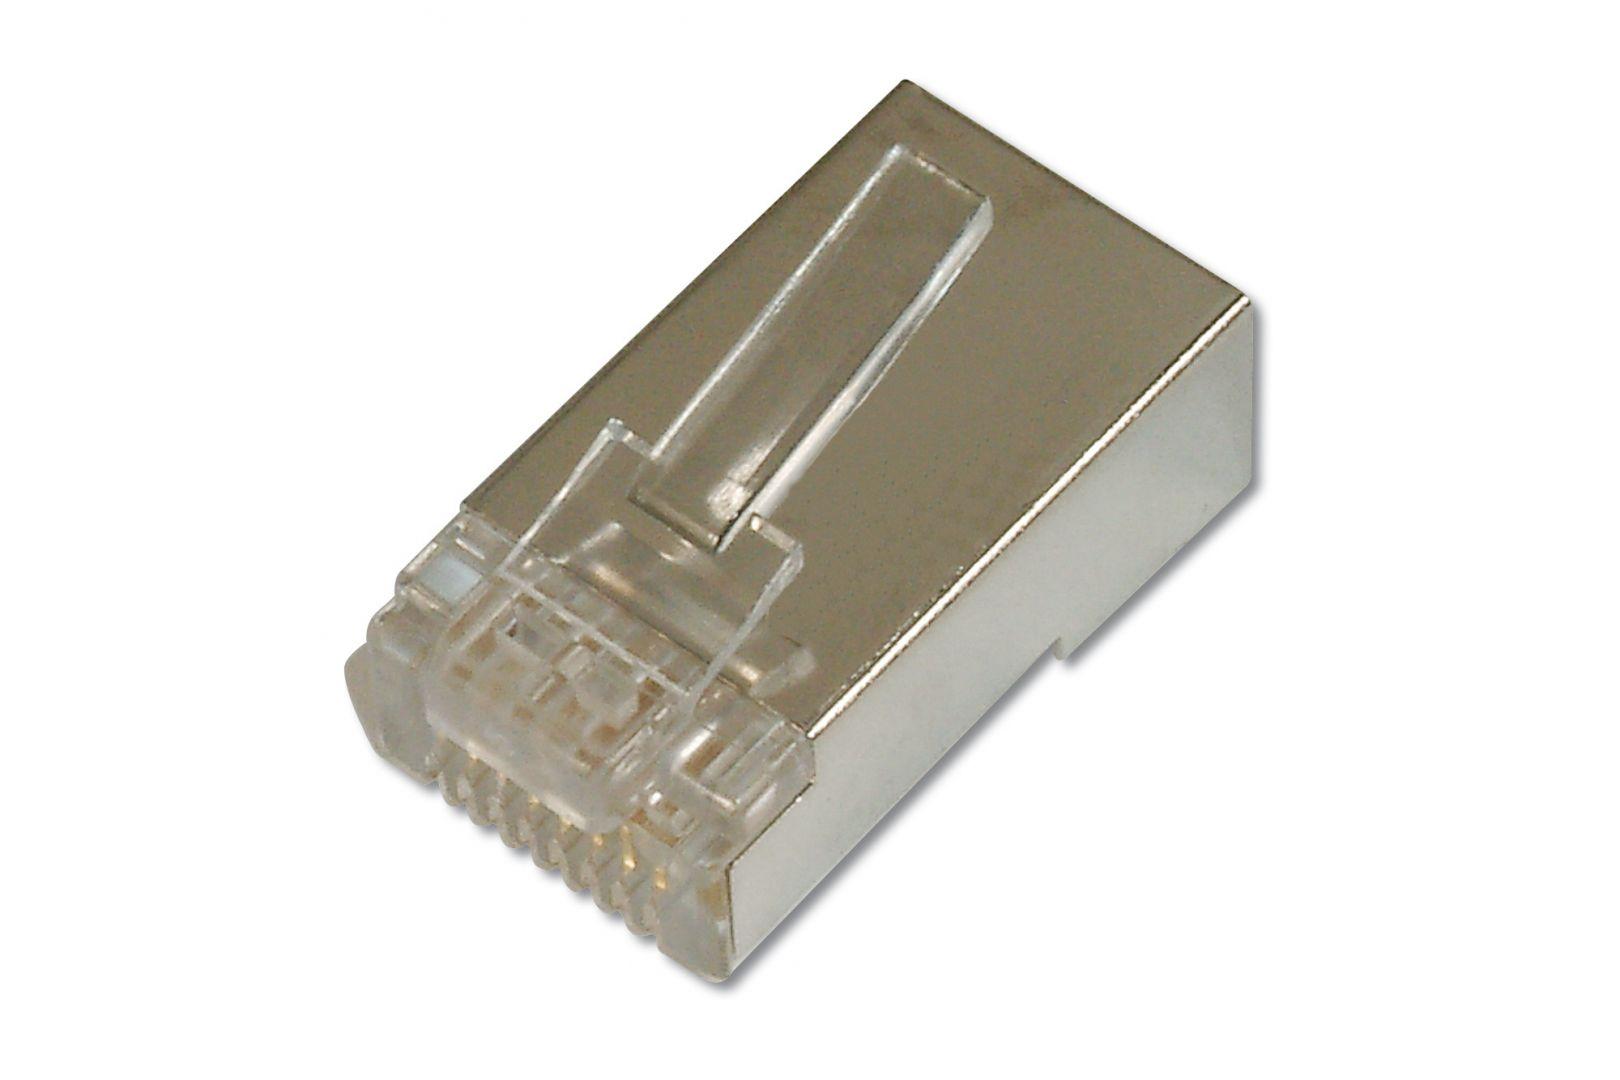 Hálózati eszközök Assmann Modular Plug, for round cable, 8P8C, CAT 5